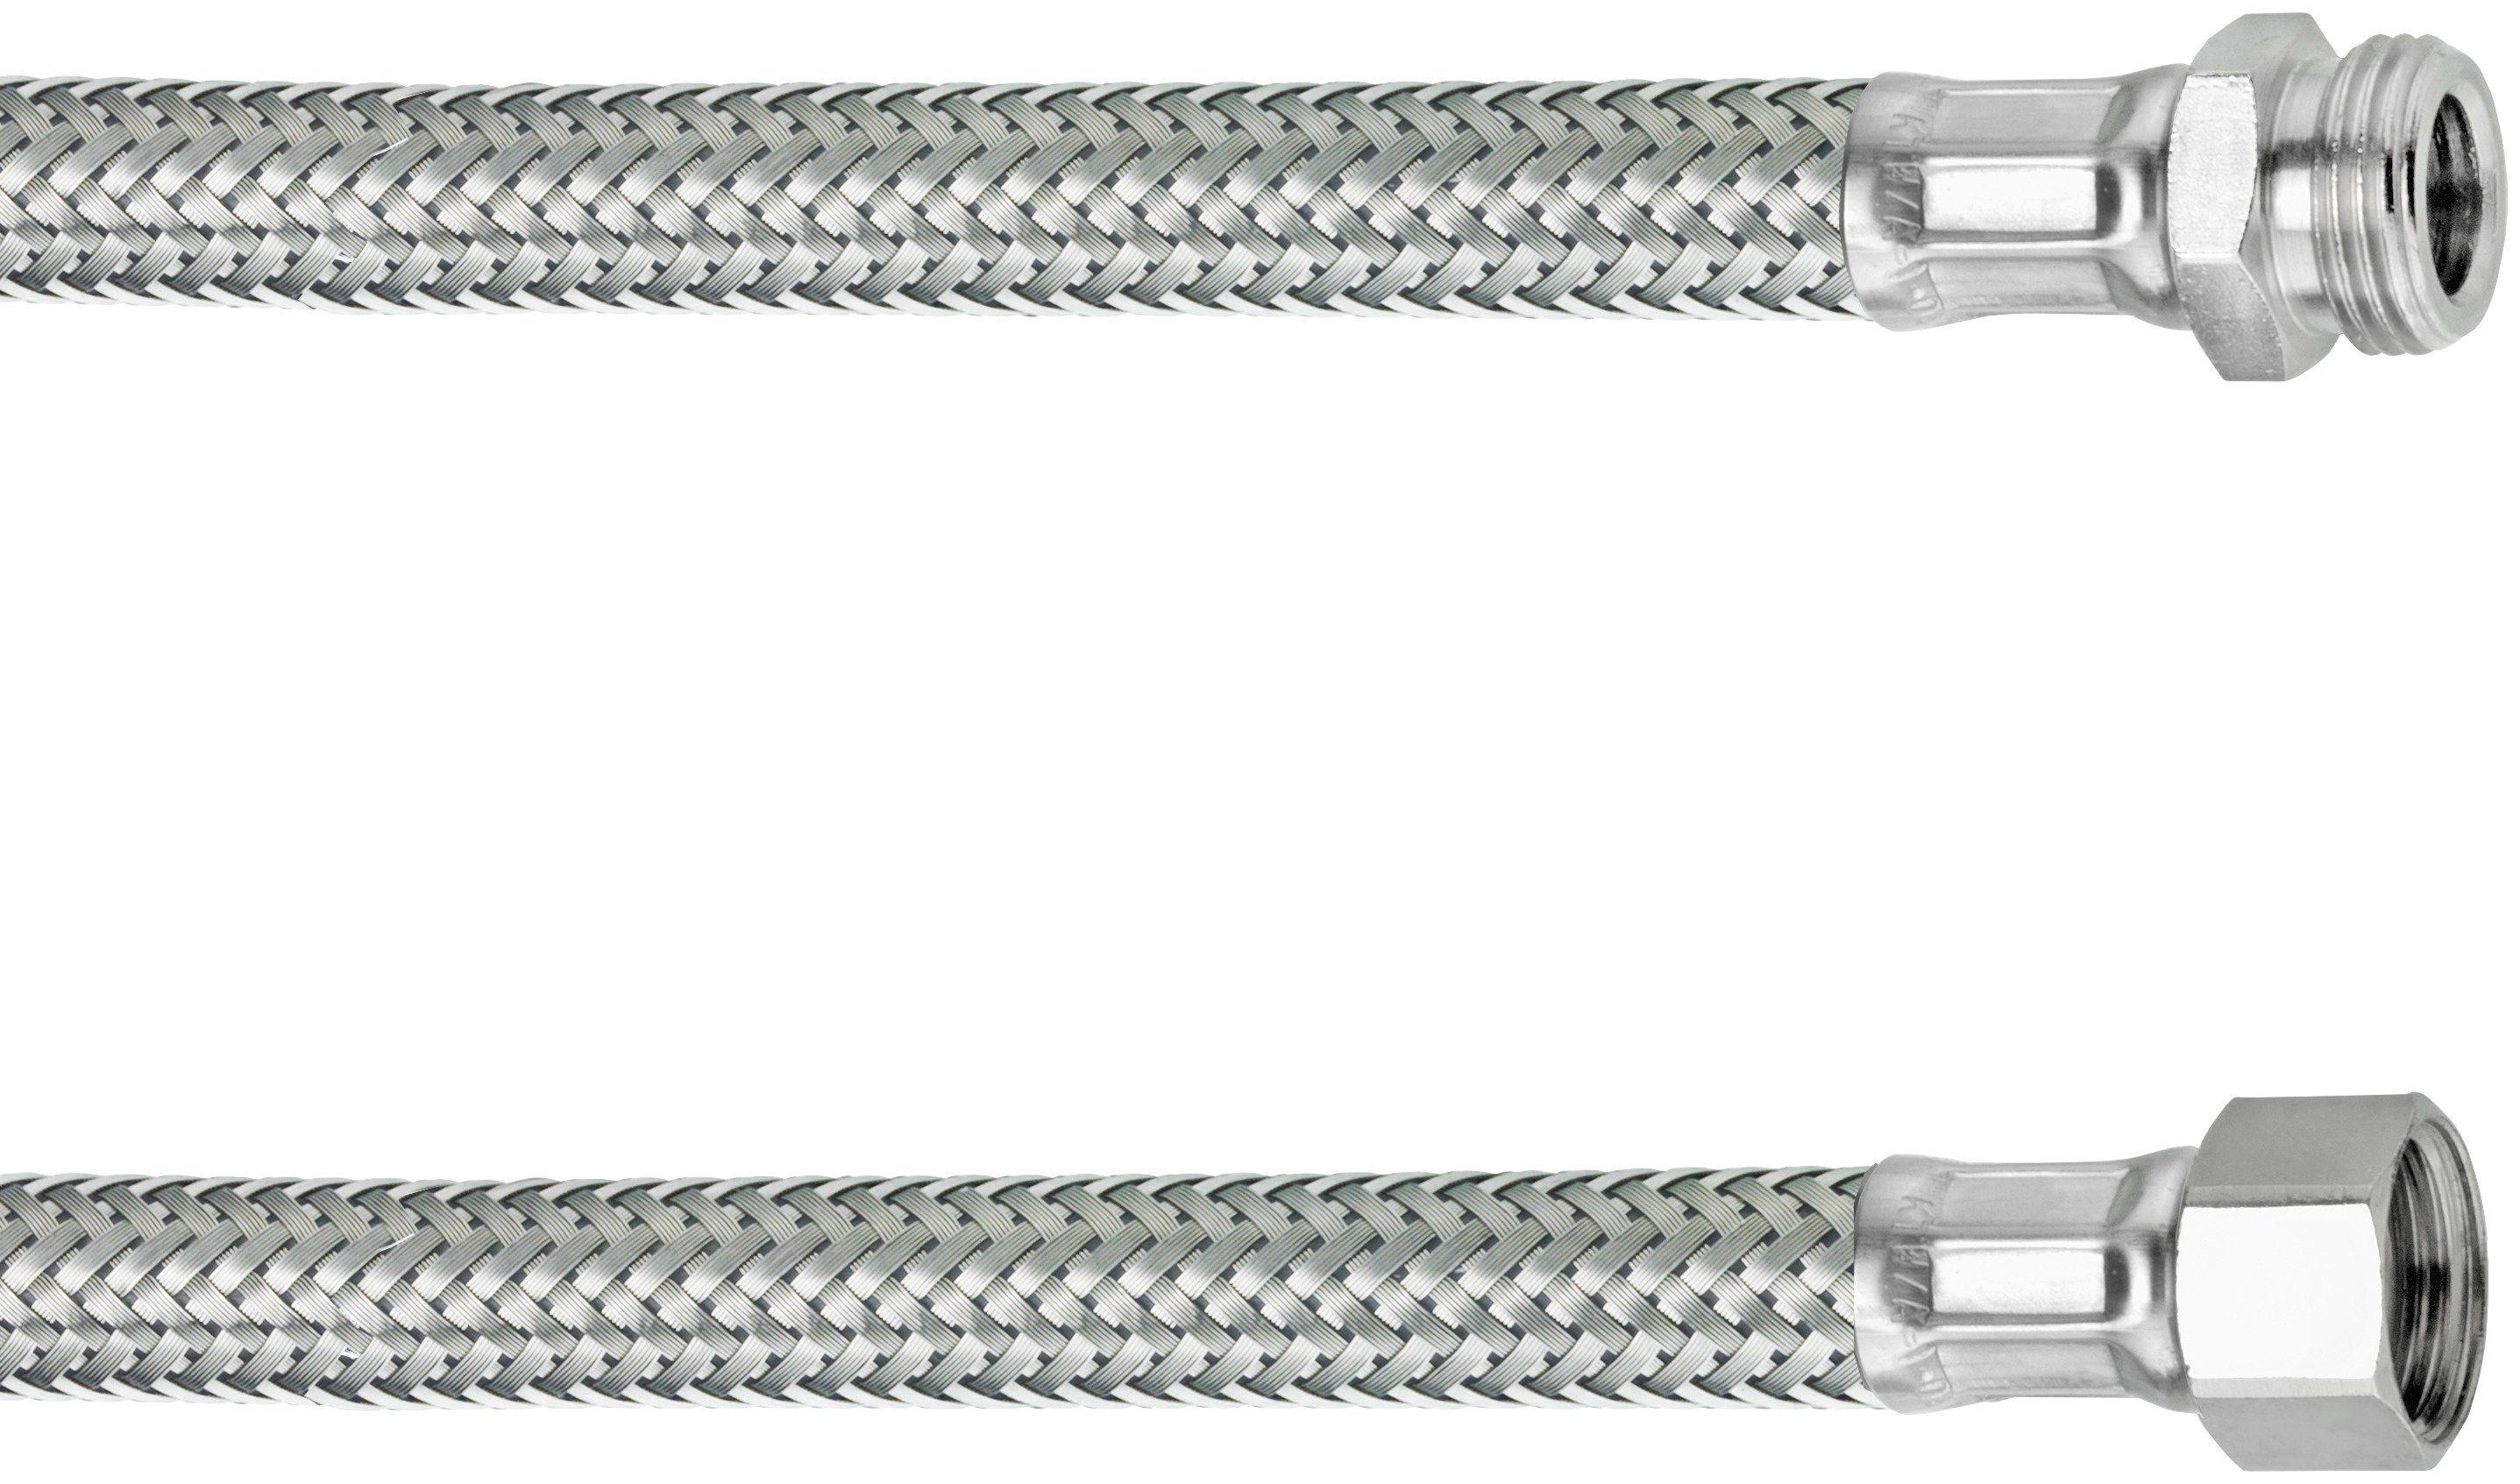 CORNAT Verbindungsschlauch flexibel, 3/8 IG x 3/8 AG, 30 cm